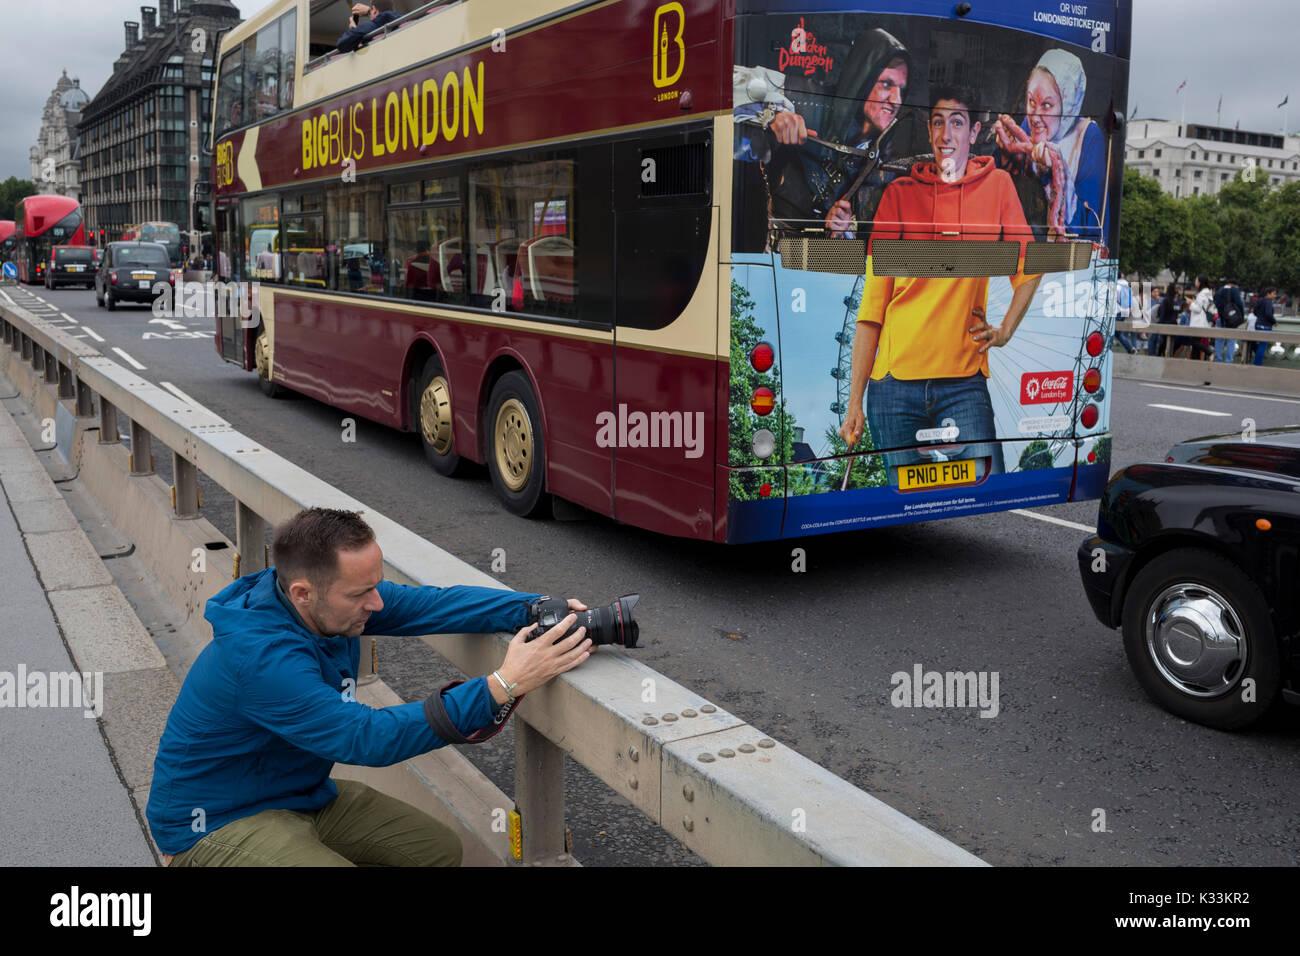 Photographer Jeremy Sutton-Hibbert, on Westminster Bridge, on 21st August 2017. - Stock Image